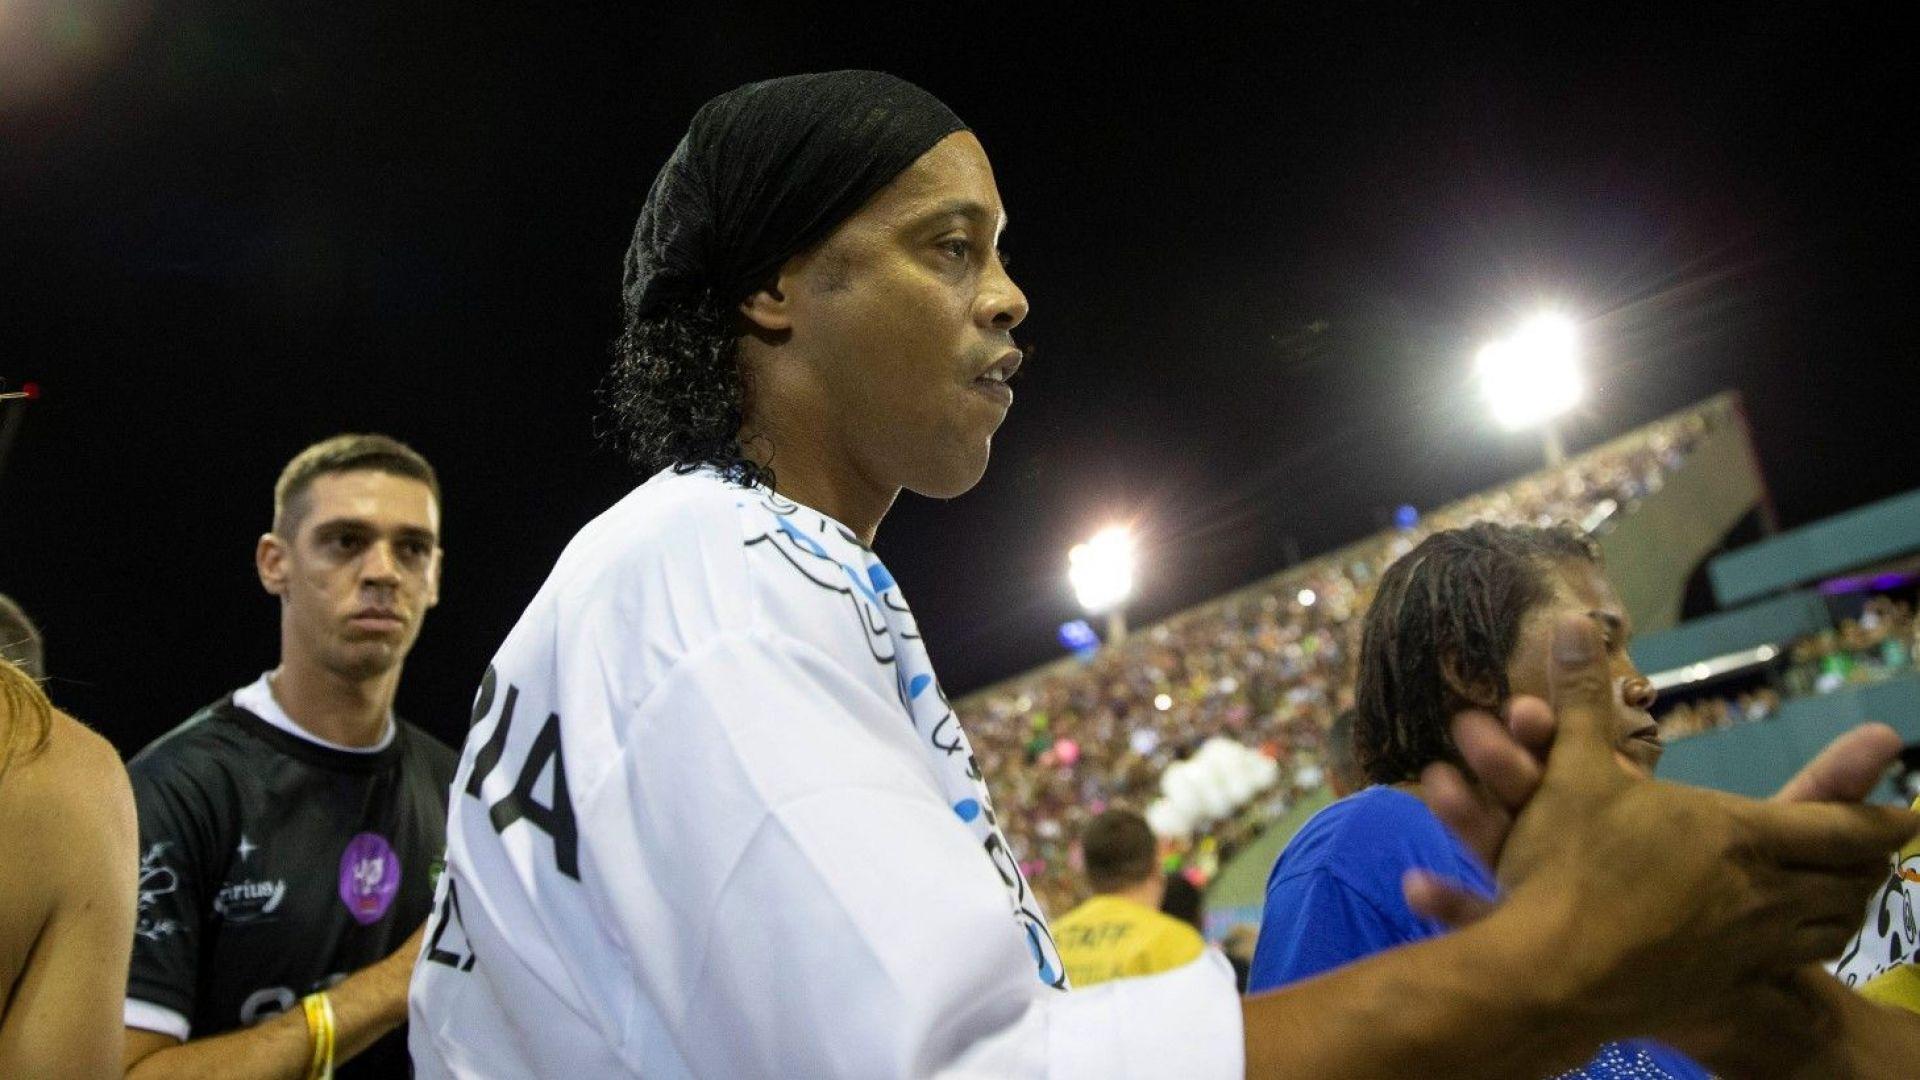 Арестуваха Роналдиньо в Парагвай с фалшиви документи (видео)